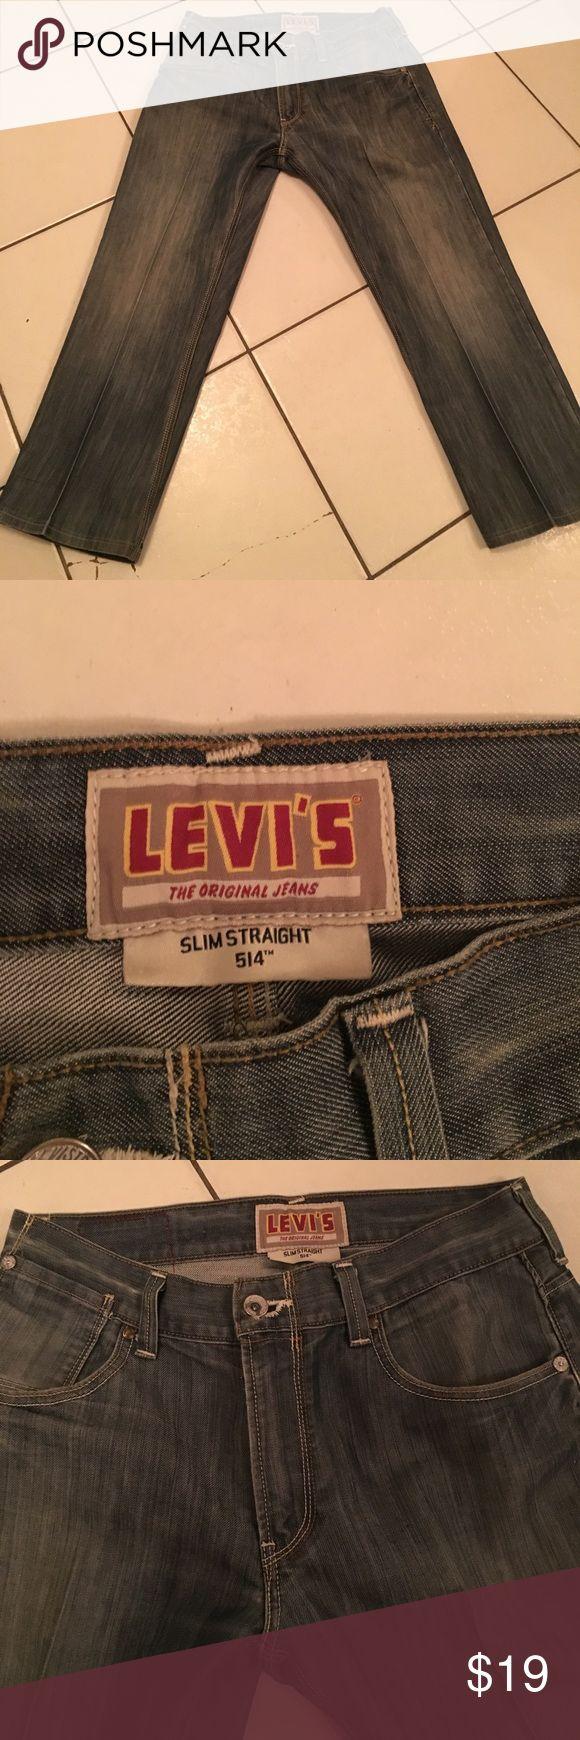 Levi's Jeans 514 Levi jeans 514 great condition waist 34 length 30 Slim men's 👔 Bundle all men's clothing 6 items for $20.00 or 13 items for $40.00 Levis Jeans